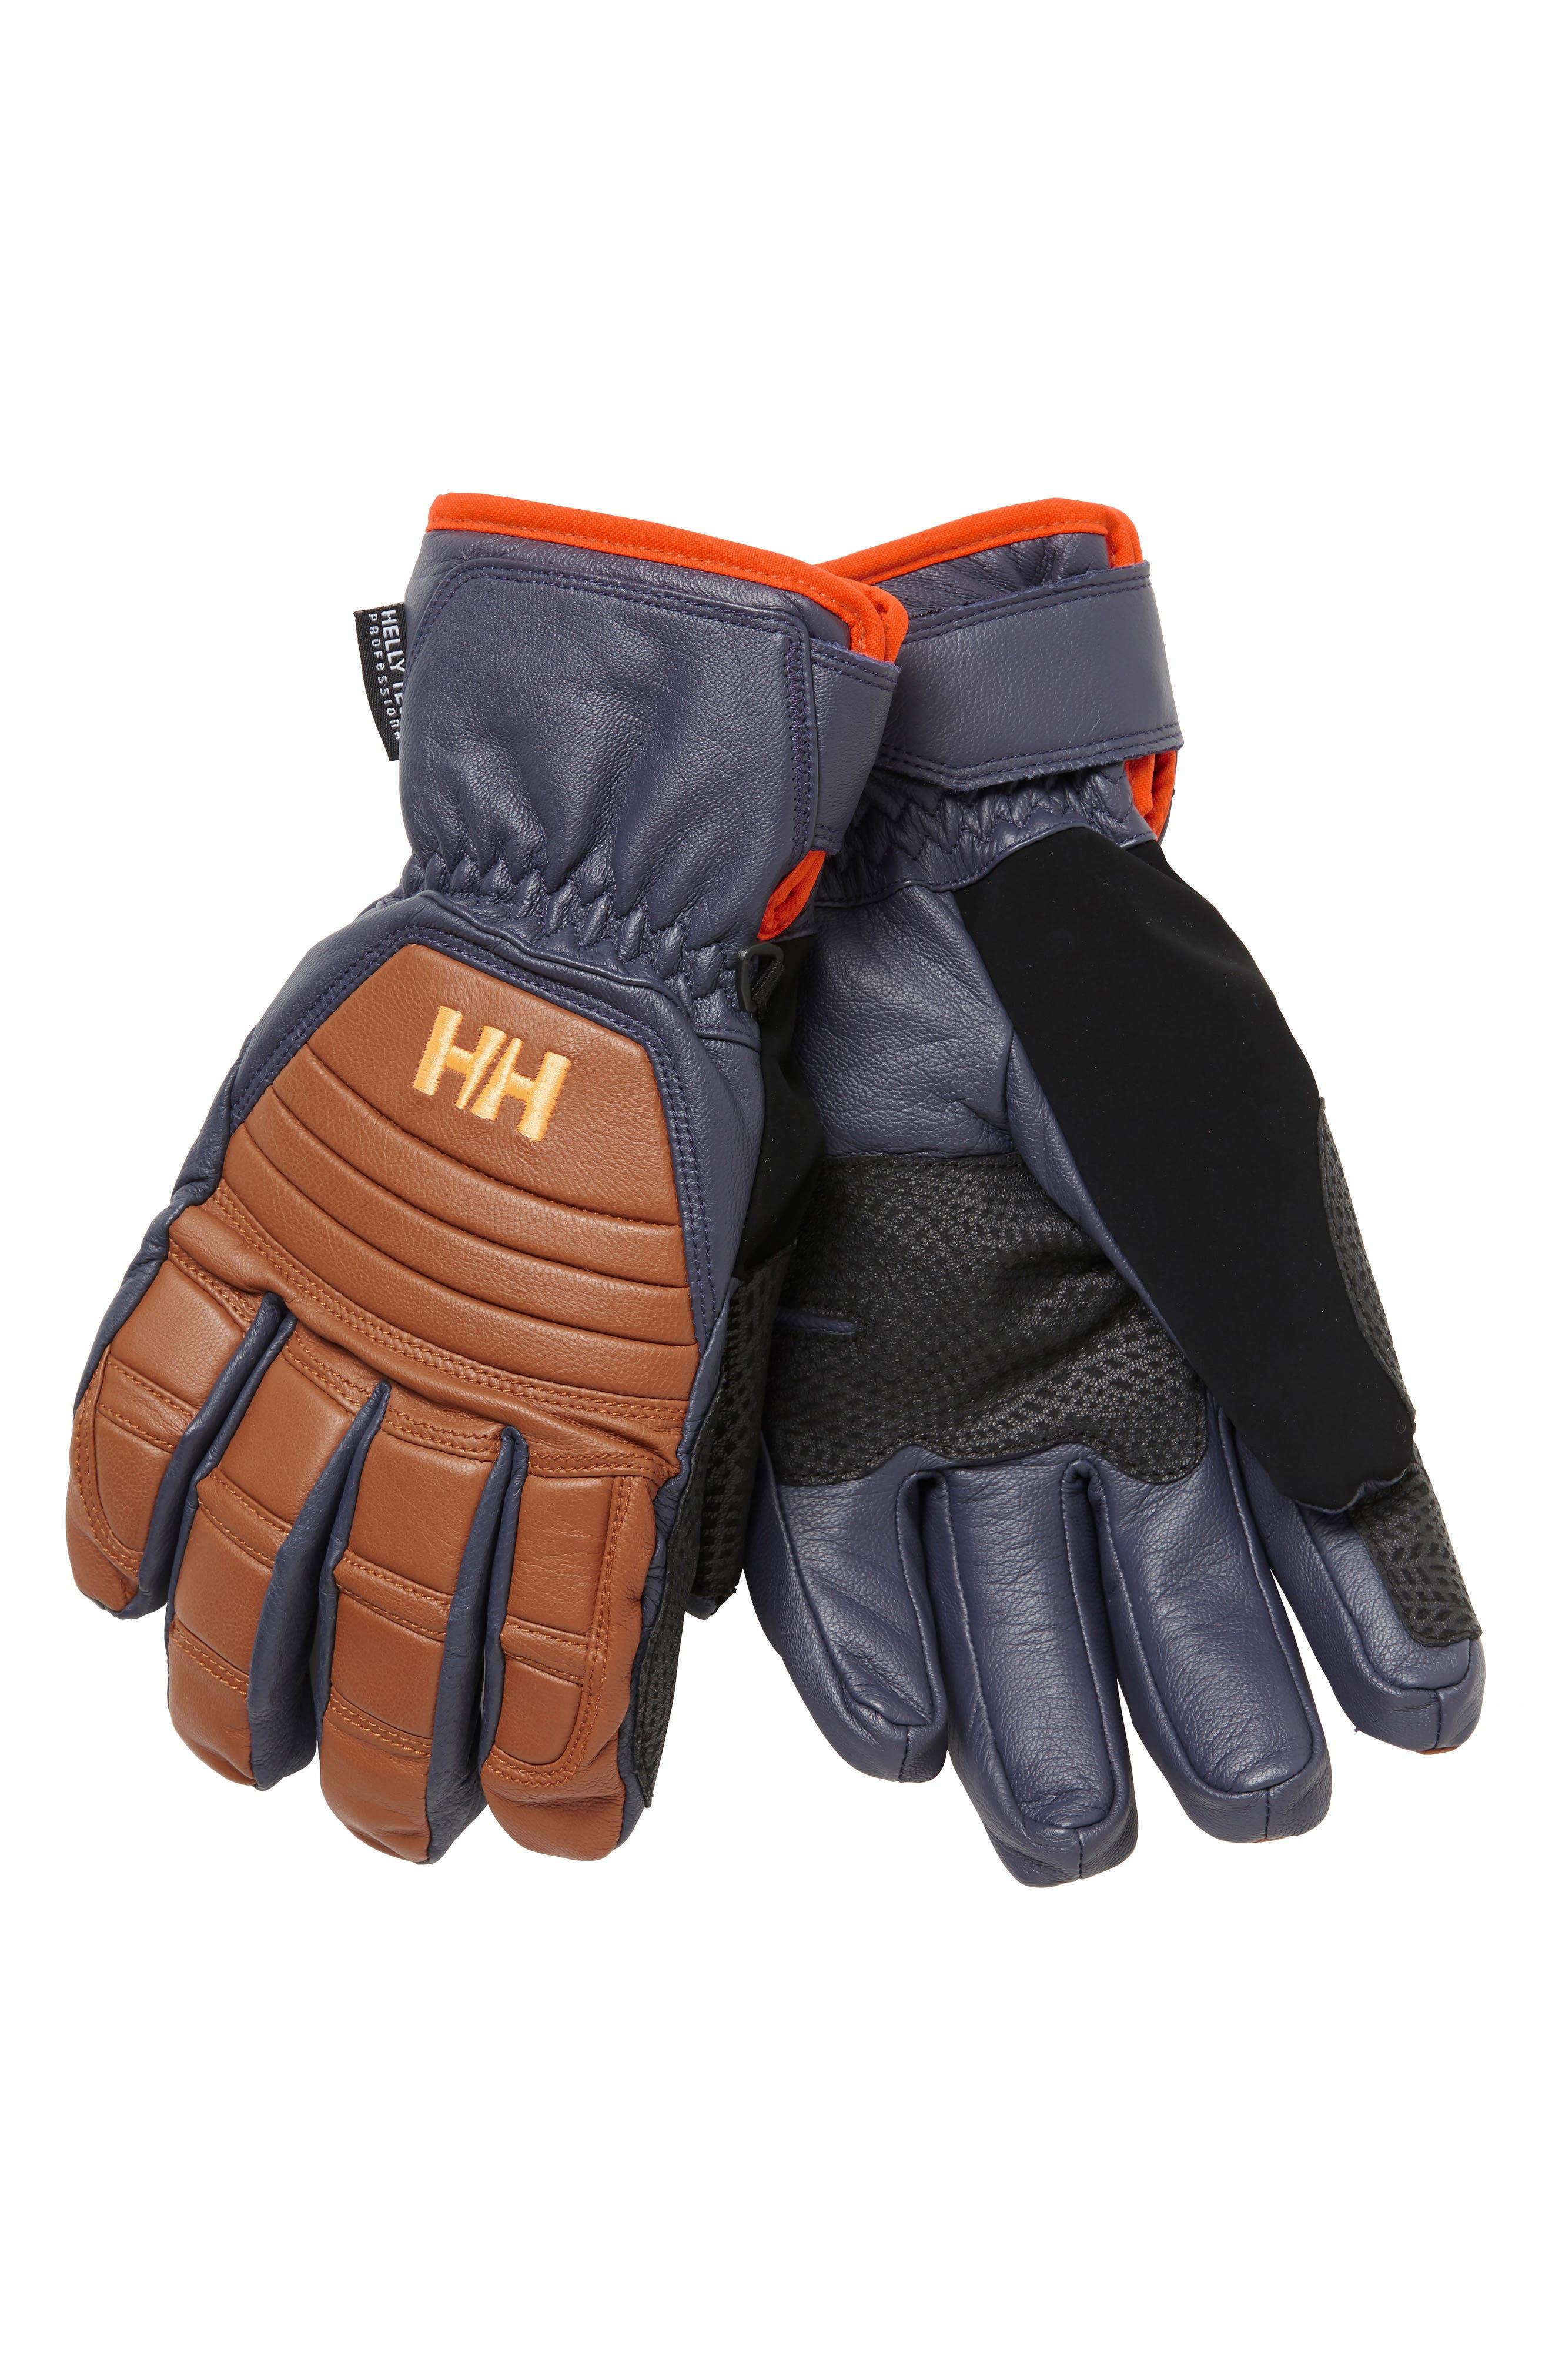 Ullr Leather Ski Gloves,                         Main,                         color, CINNAMON / GRAPHITE BLUE